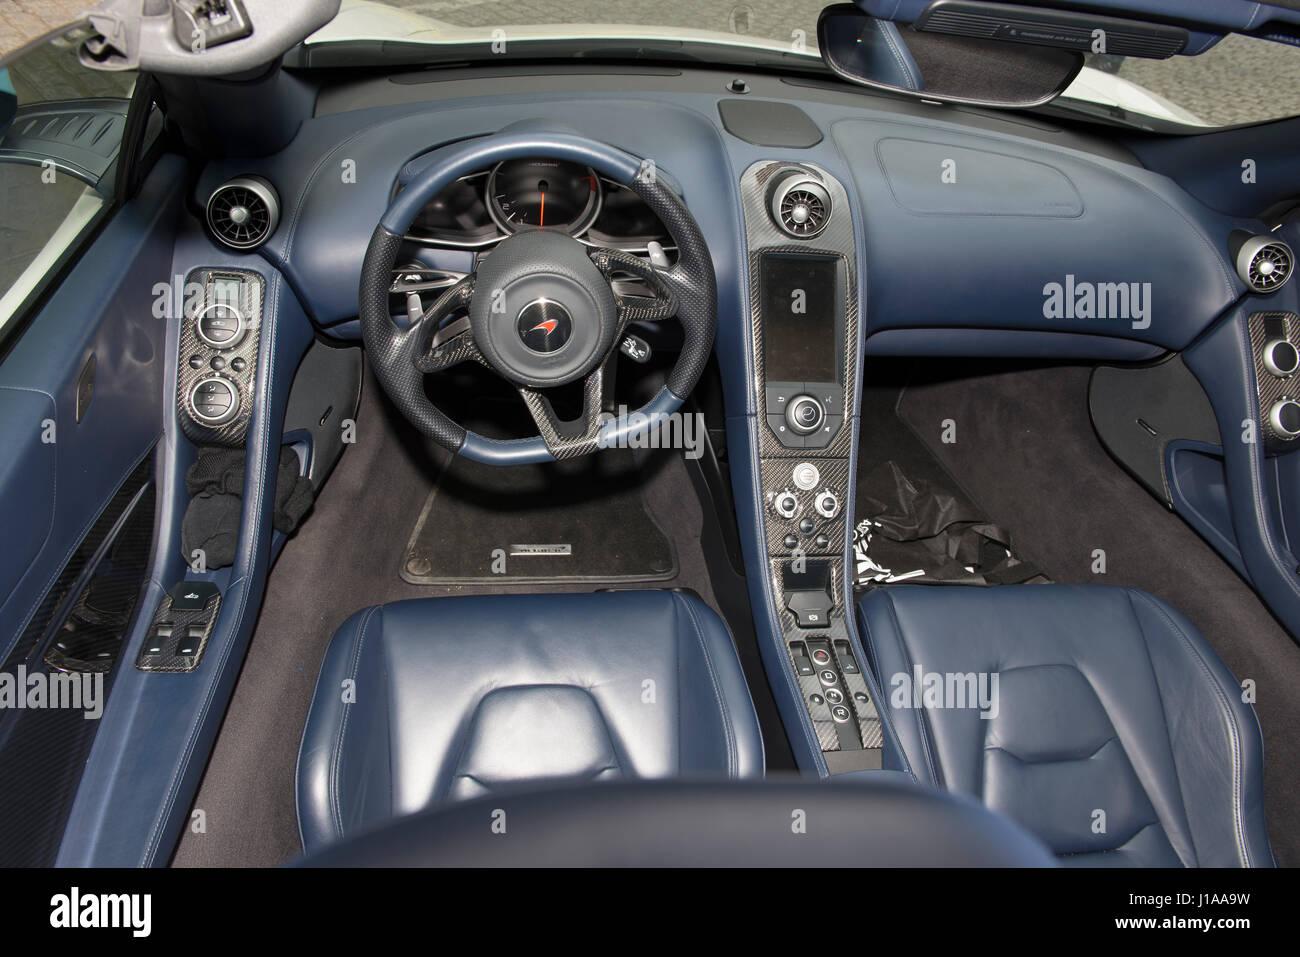 Interior Of A McLaren 650s Sportscar   Stock Image